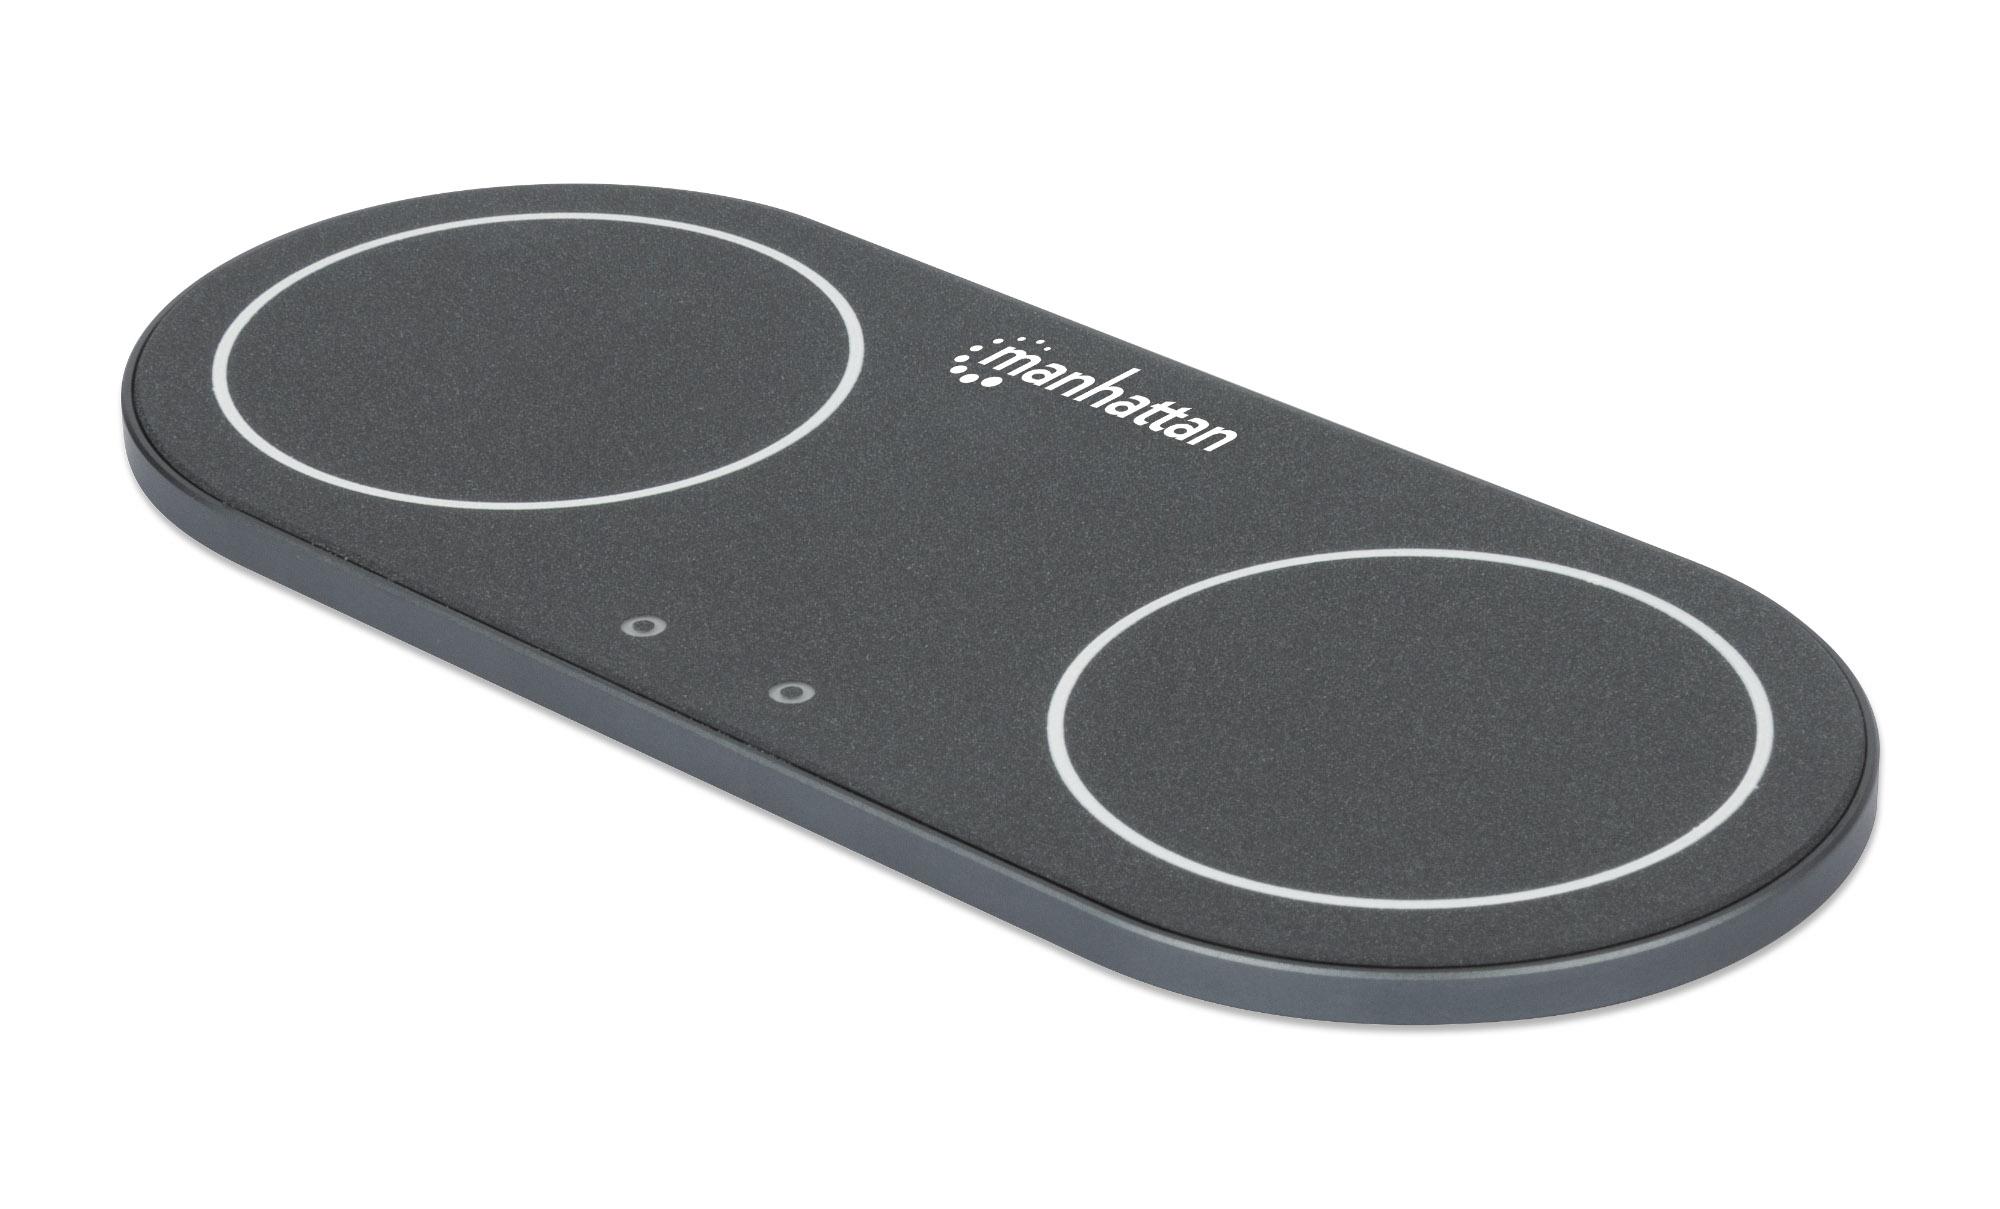 Dual Wireless Charging Pad - 30 W